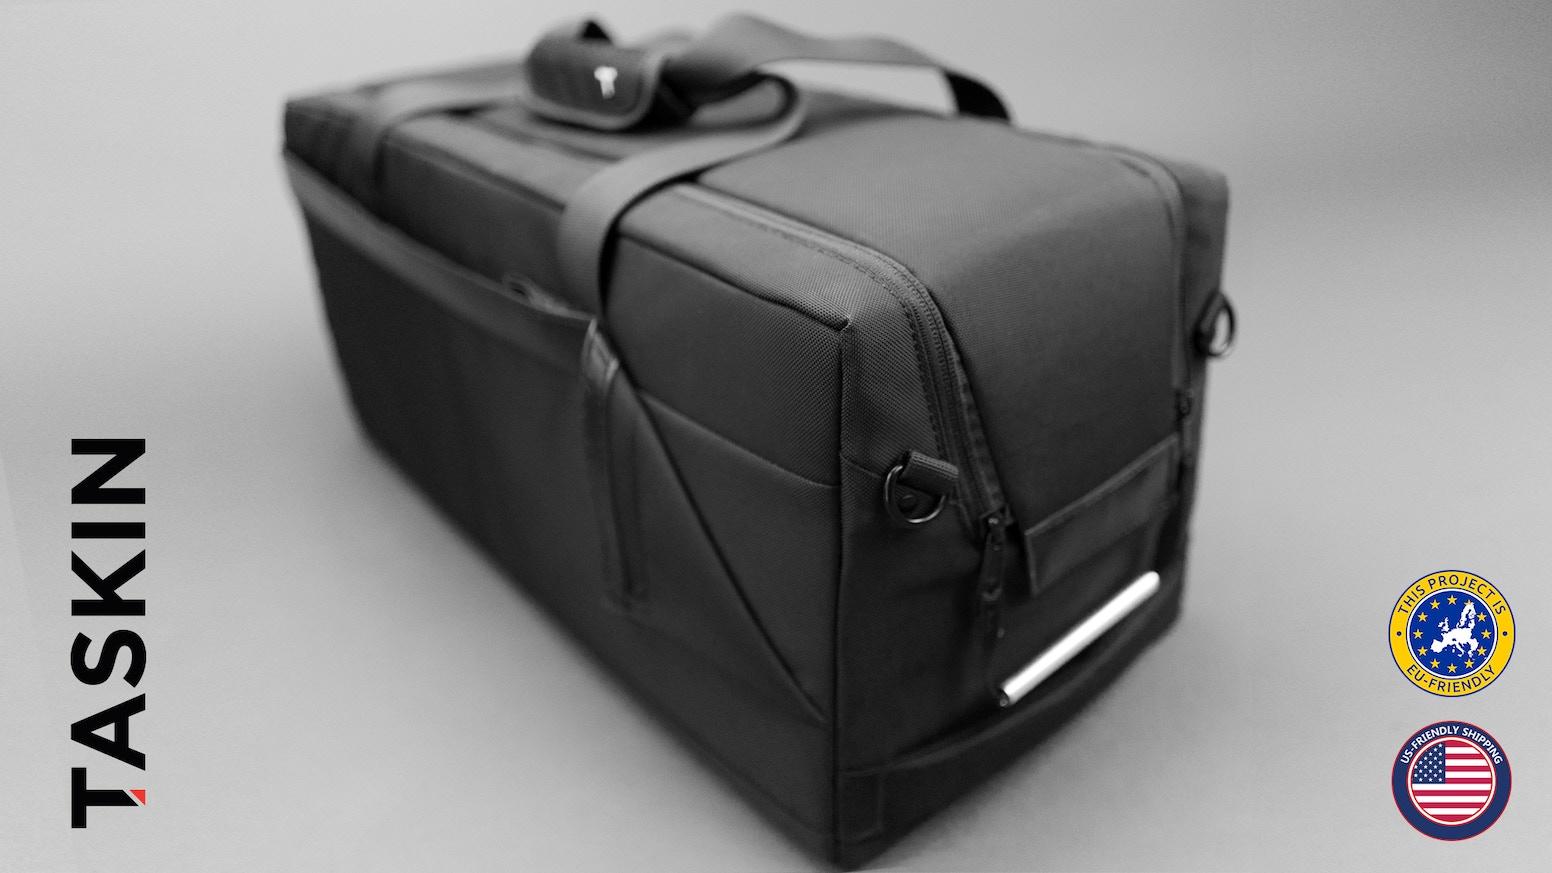 9471efa22 Sleek design and exclusive features make Taskin Kube the best-designed duffel  bag anywhere -